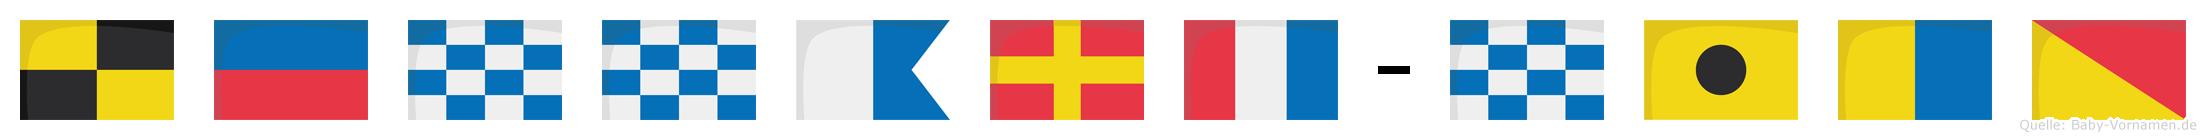 Lennart-Niko im Flaggenalphabet